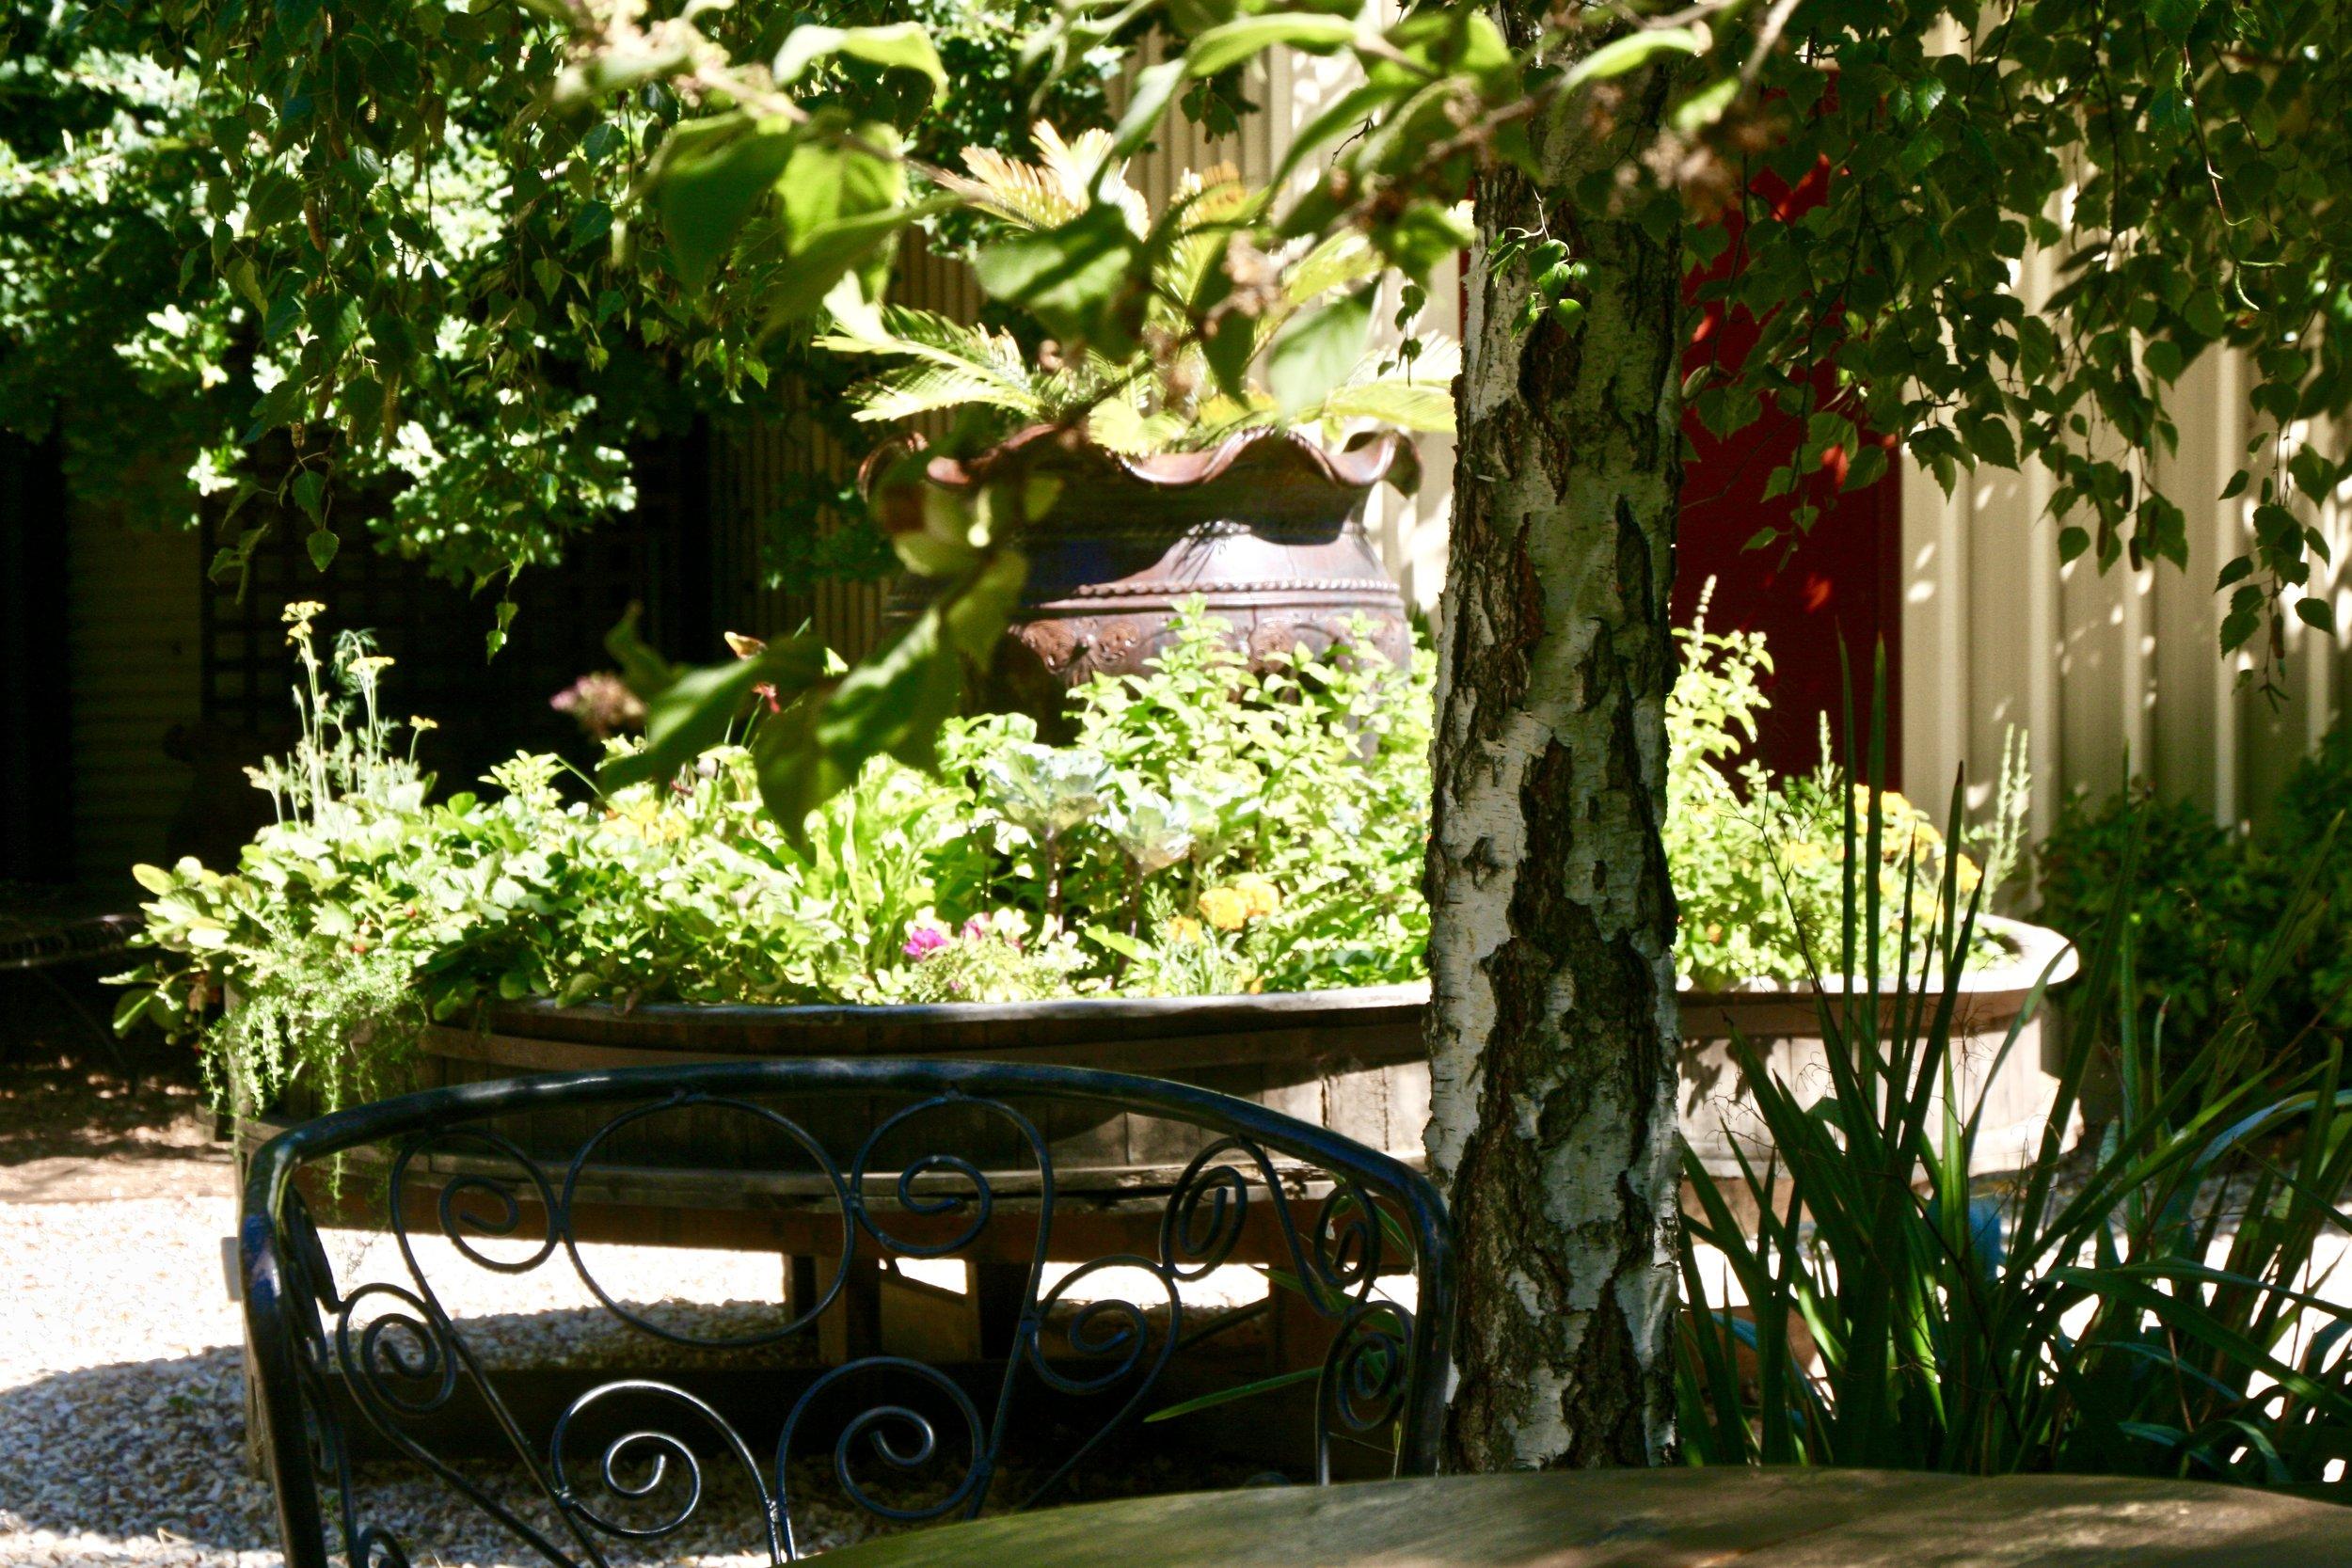 Enjoy the Gardens at The Eaglehawk Hotel Maldon